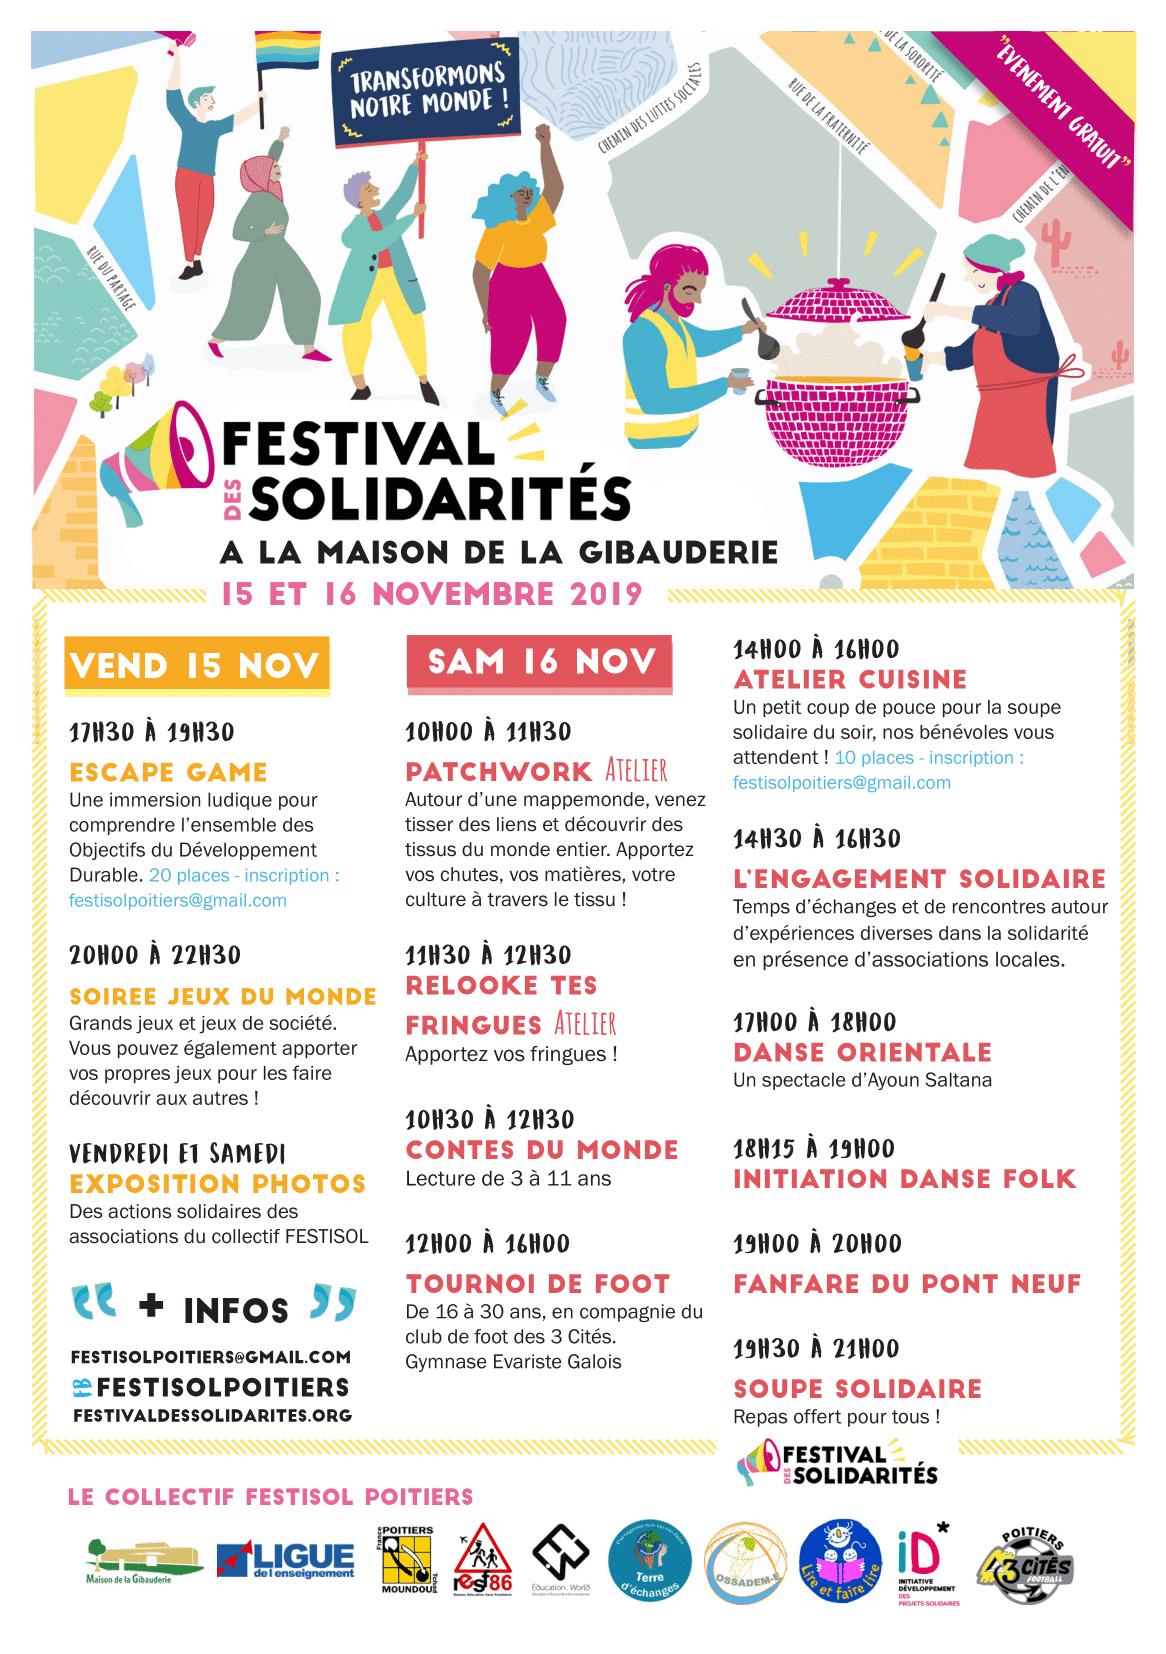 Festisol 2019 Poitiers Programme